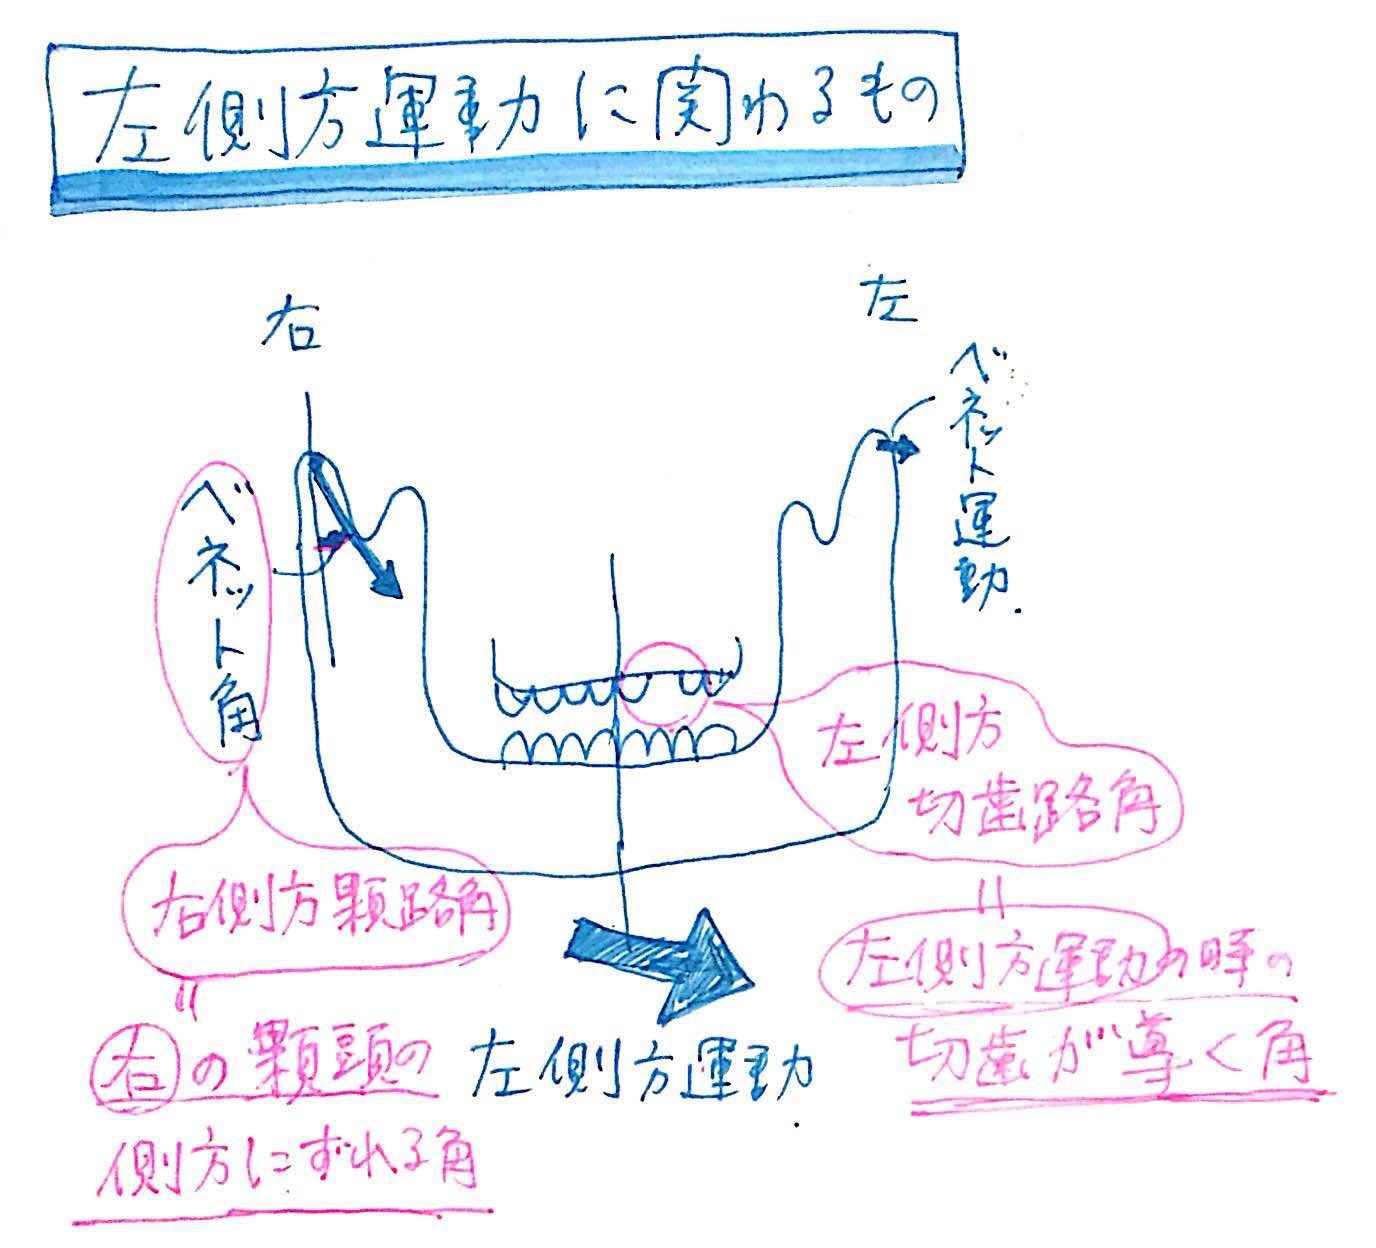 Incisal path angle